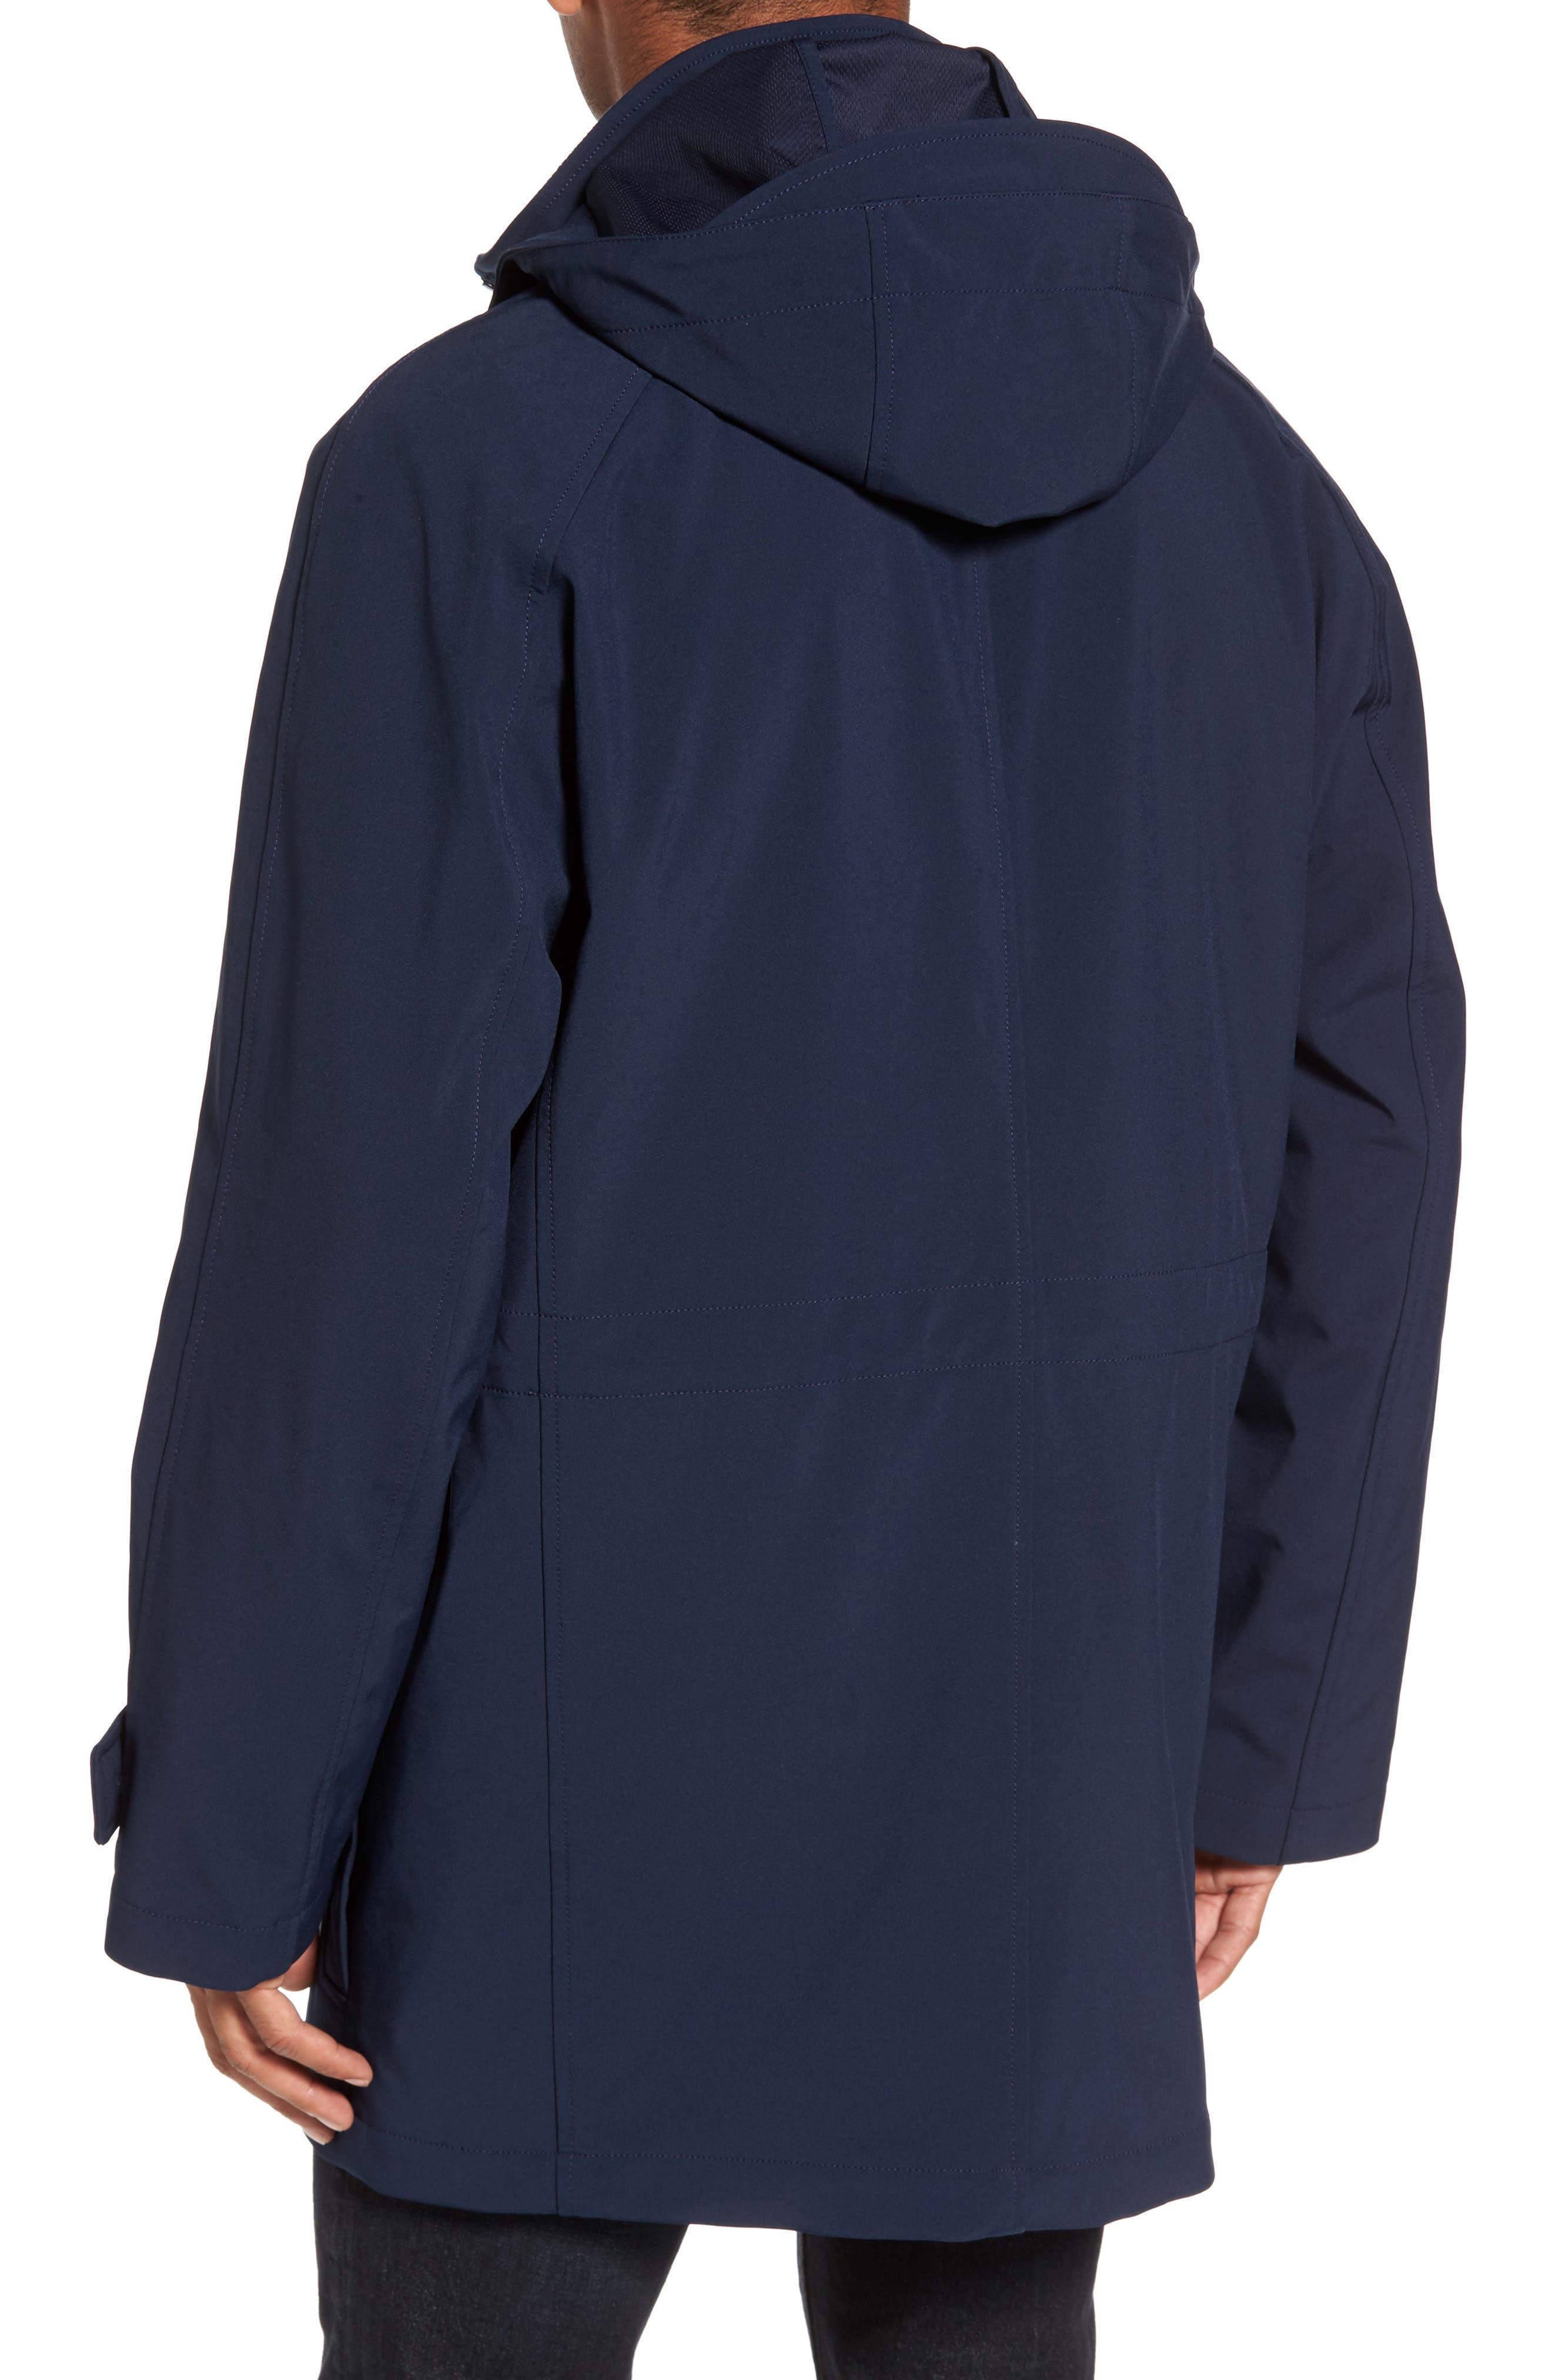 Technical Longline Jacket,                             Alternate thumbnail 2, color,                             410